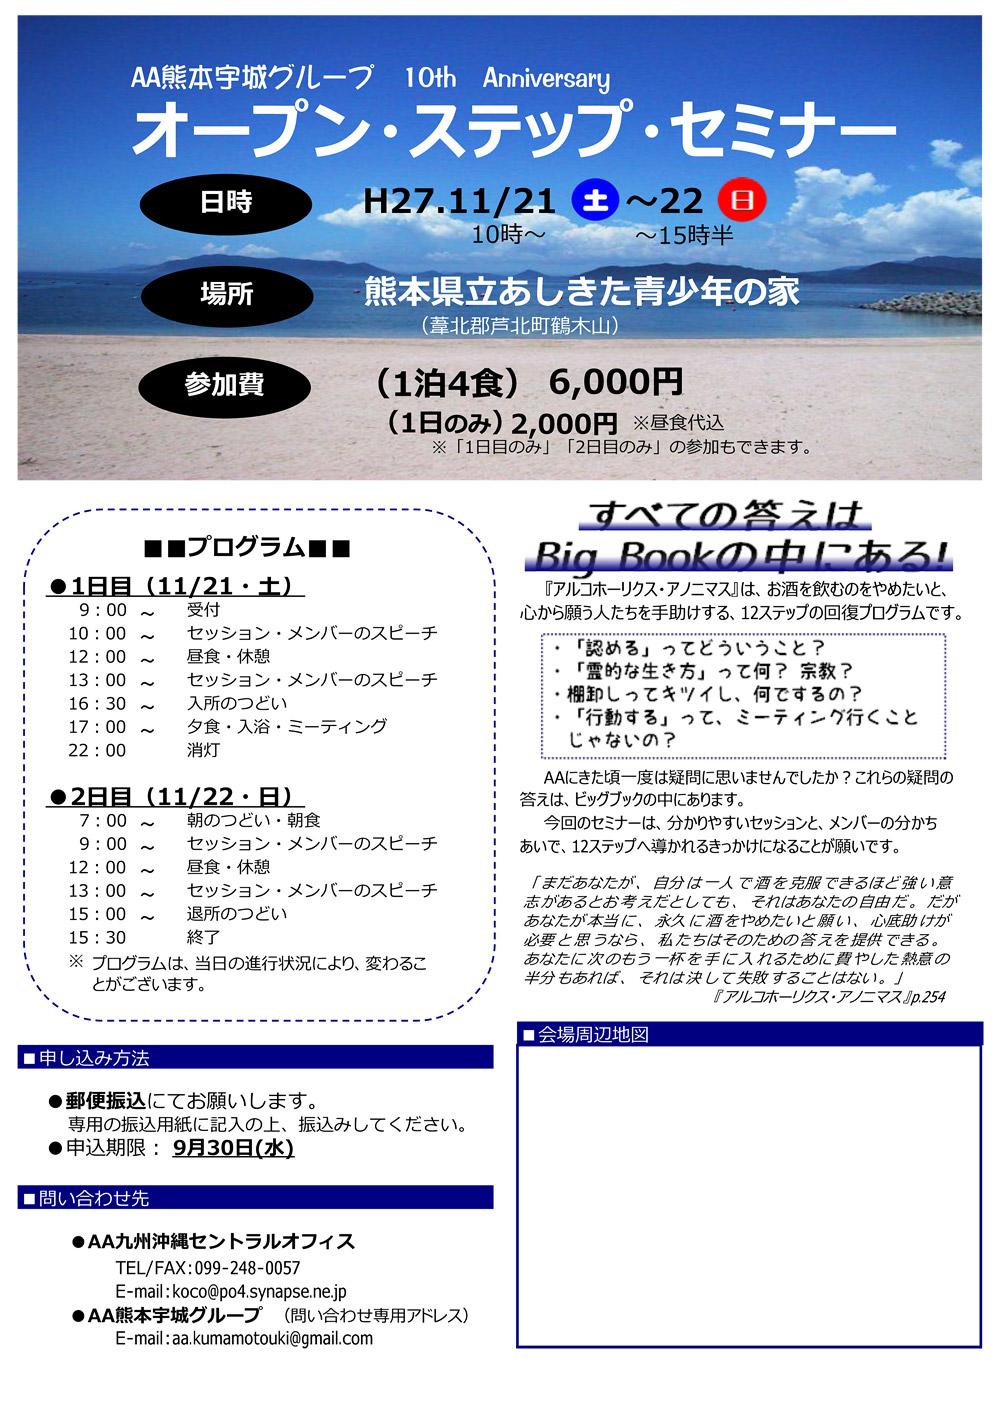 http://www.ieji.org/dilemma/2015/11/16/Kumamoto2015-1000.jpg